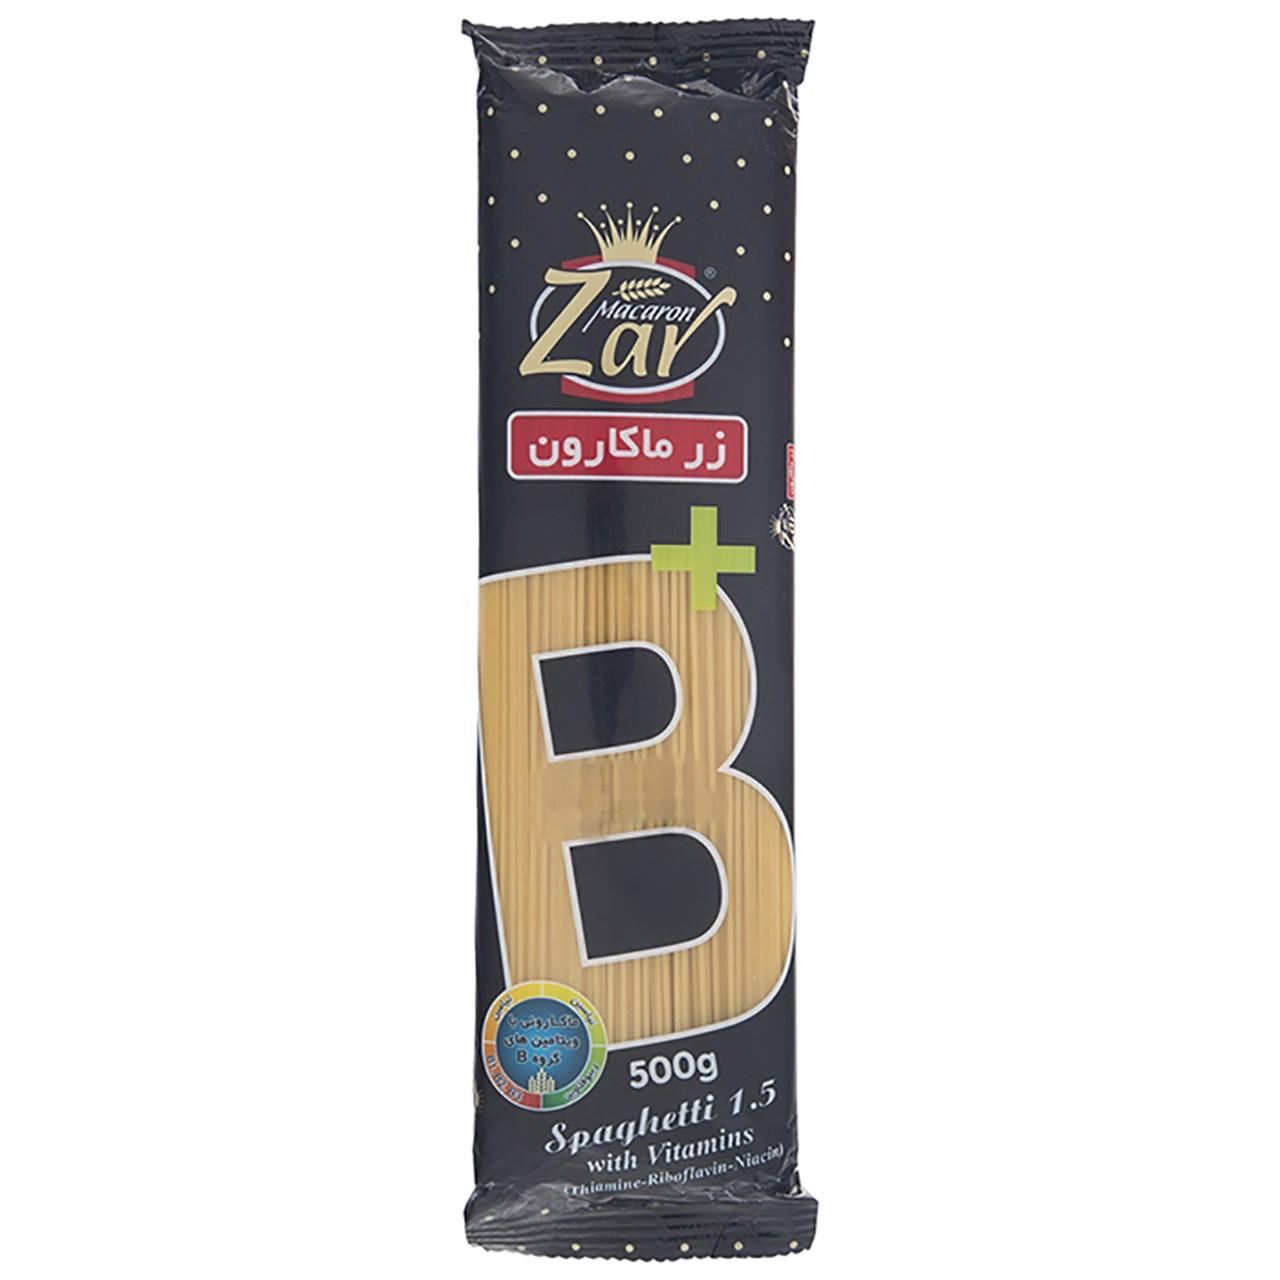 اسپاگتی قطر 1.5 حاوی ویتامین B زر ماکارون مقدار 500 گرم